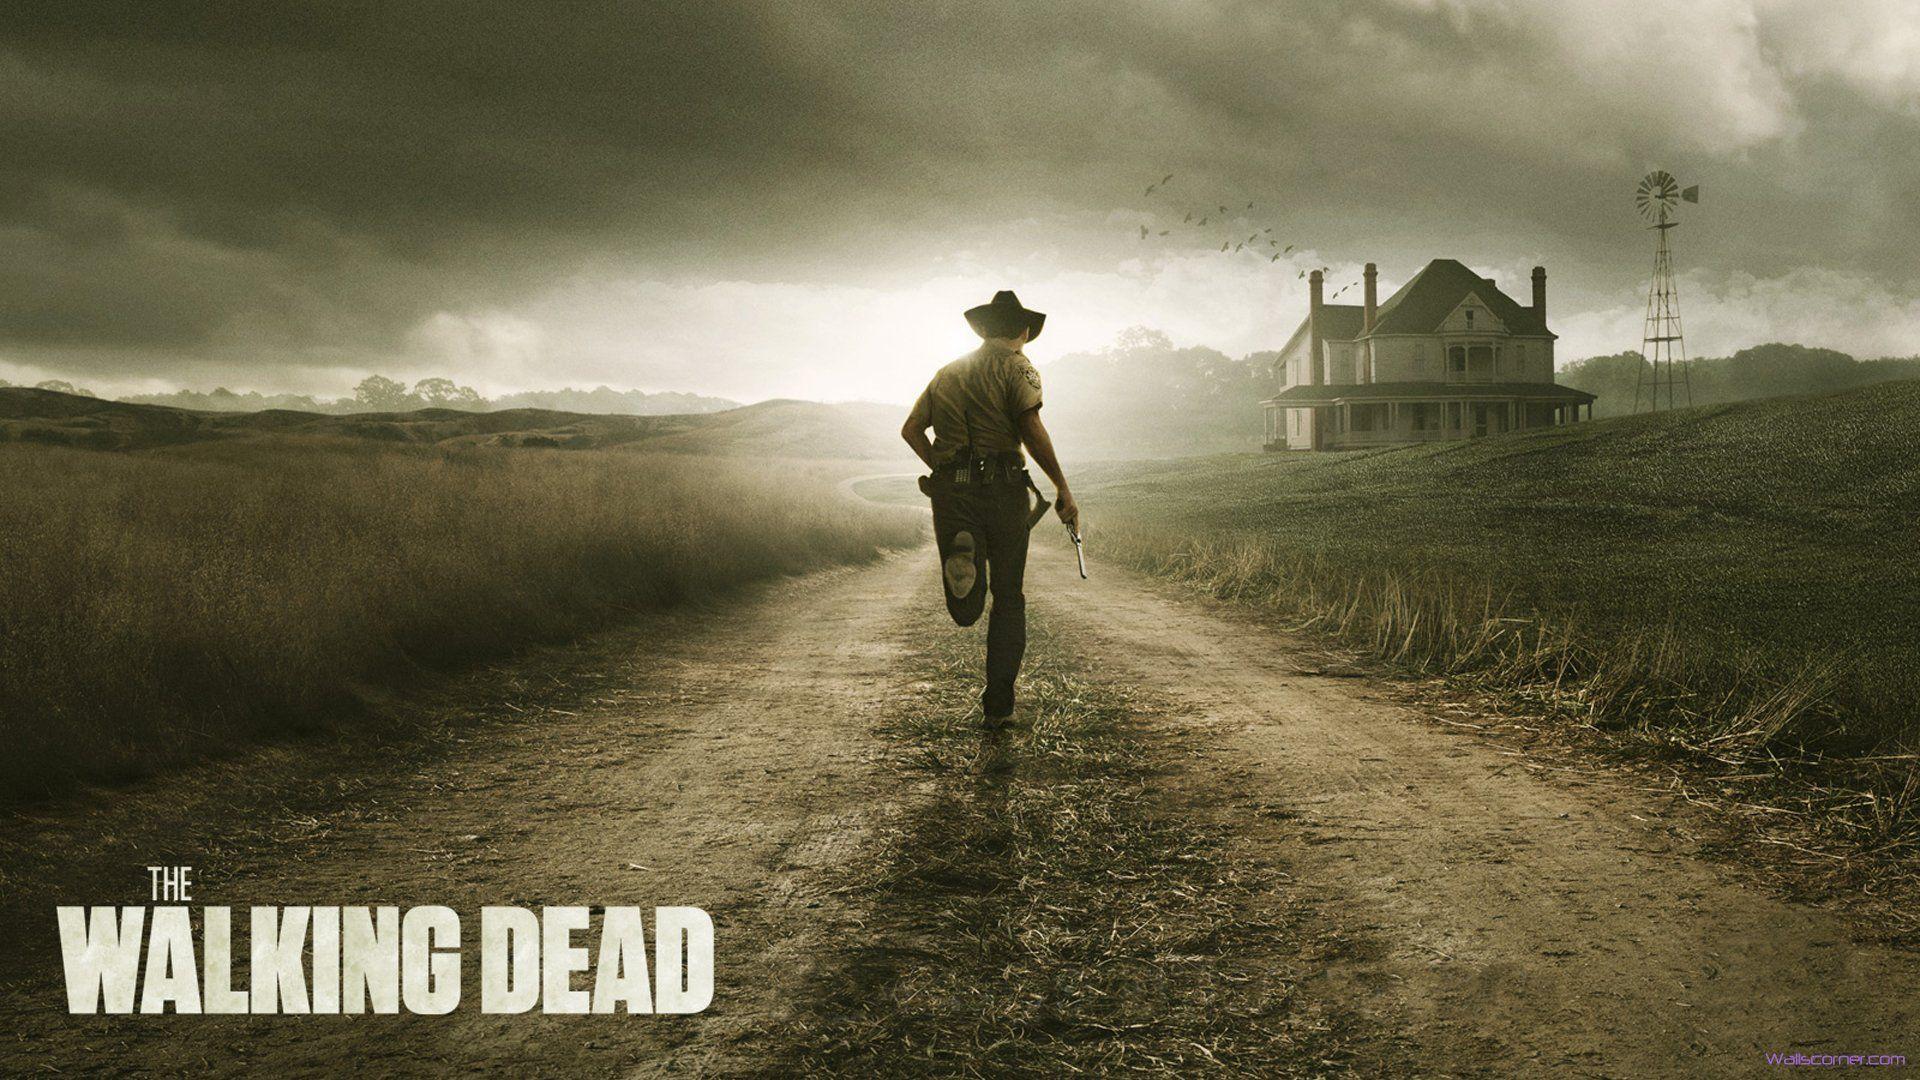 Walking Dead Wallpapers 1080p - Wallpaper Cave